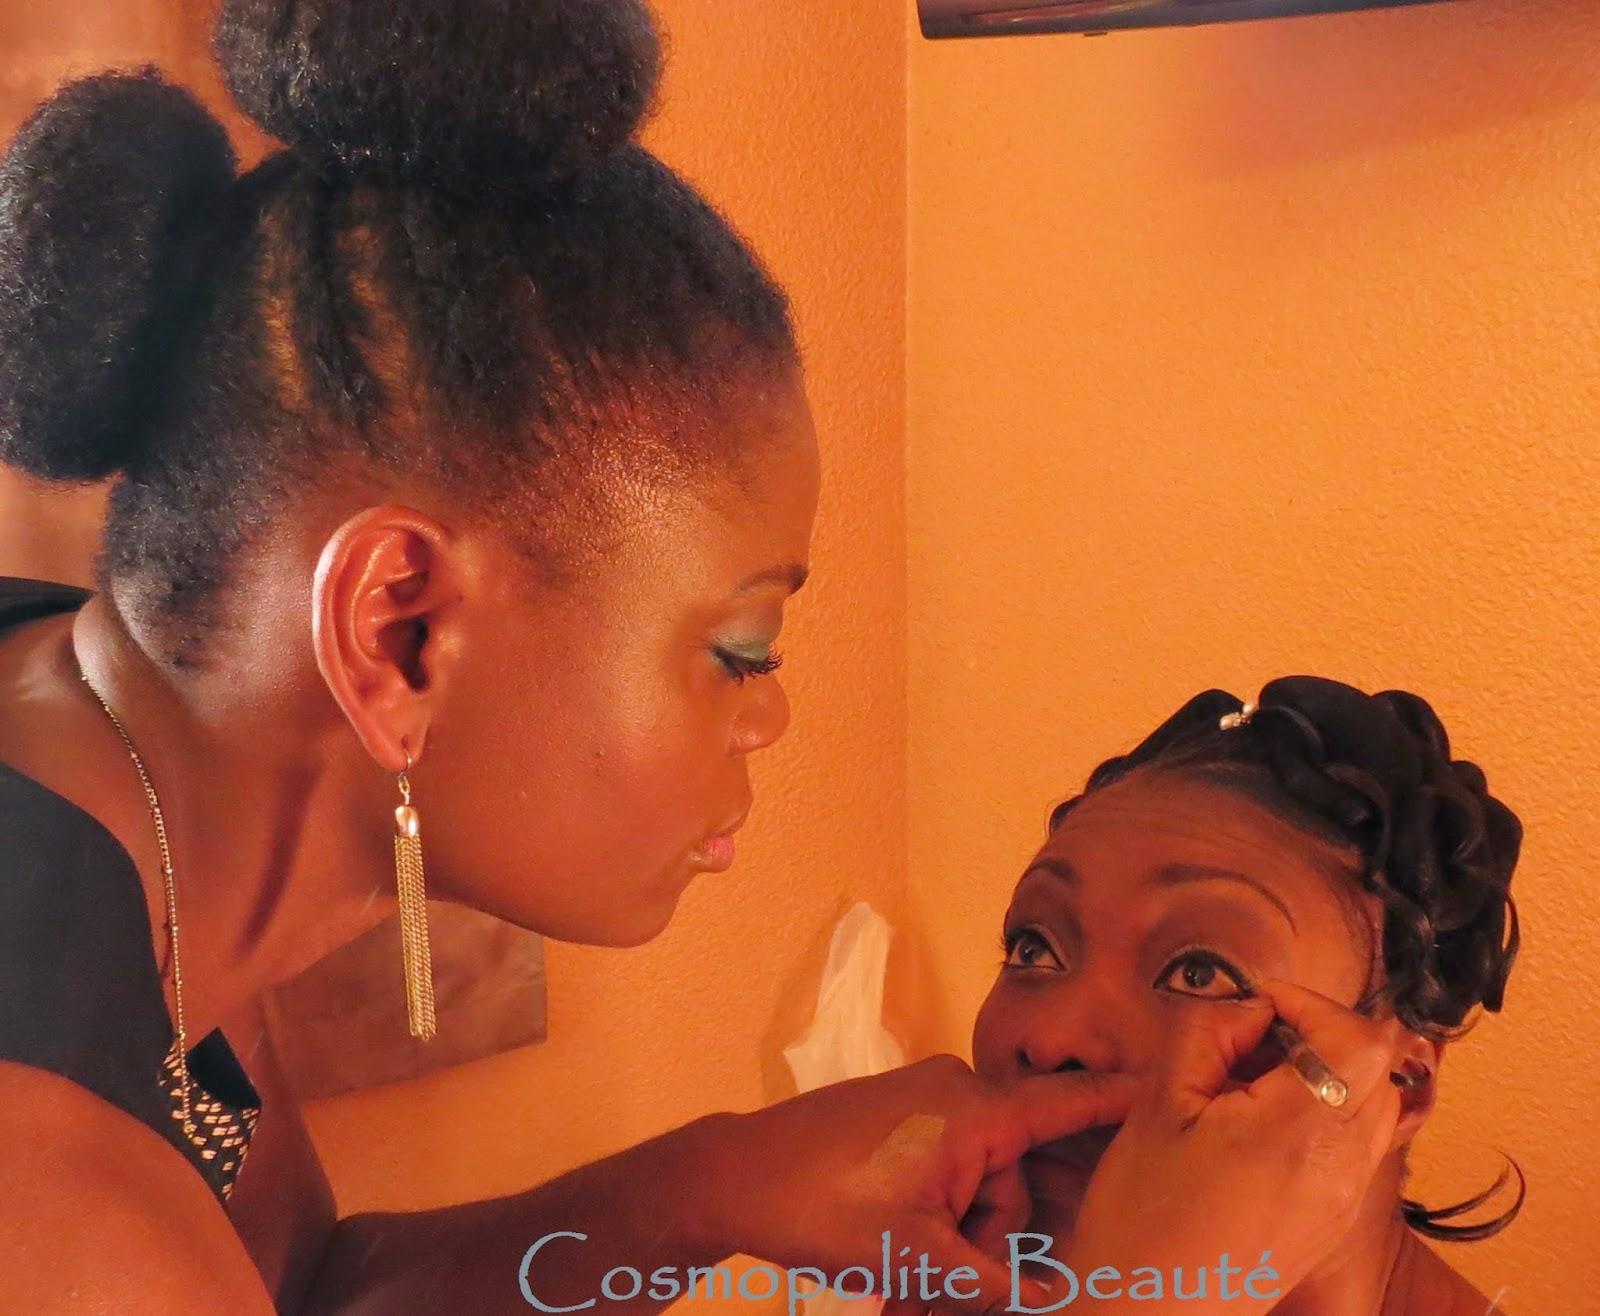 MUA, maquillage mariée, mariage, lookbook, tenue pour mariage, high bun, chignon, chignon haut, bun , blog beauté, fashion blog, mode, coiffure